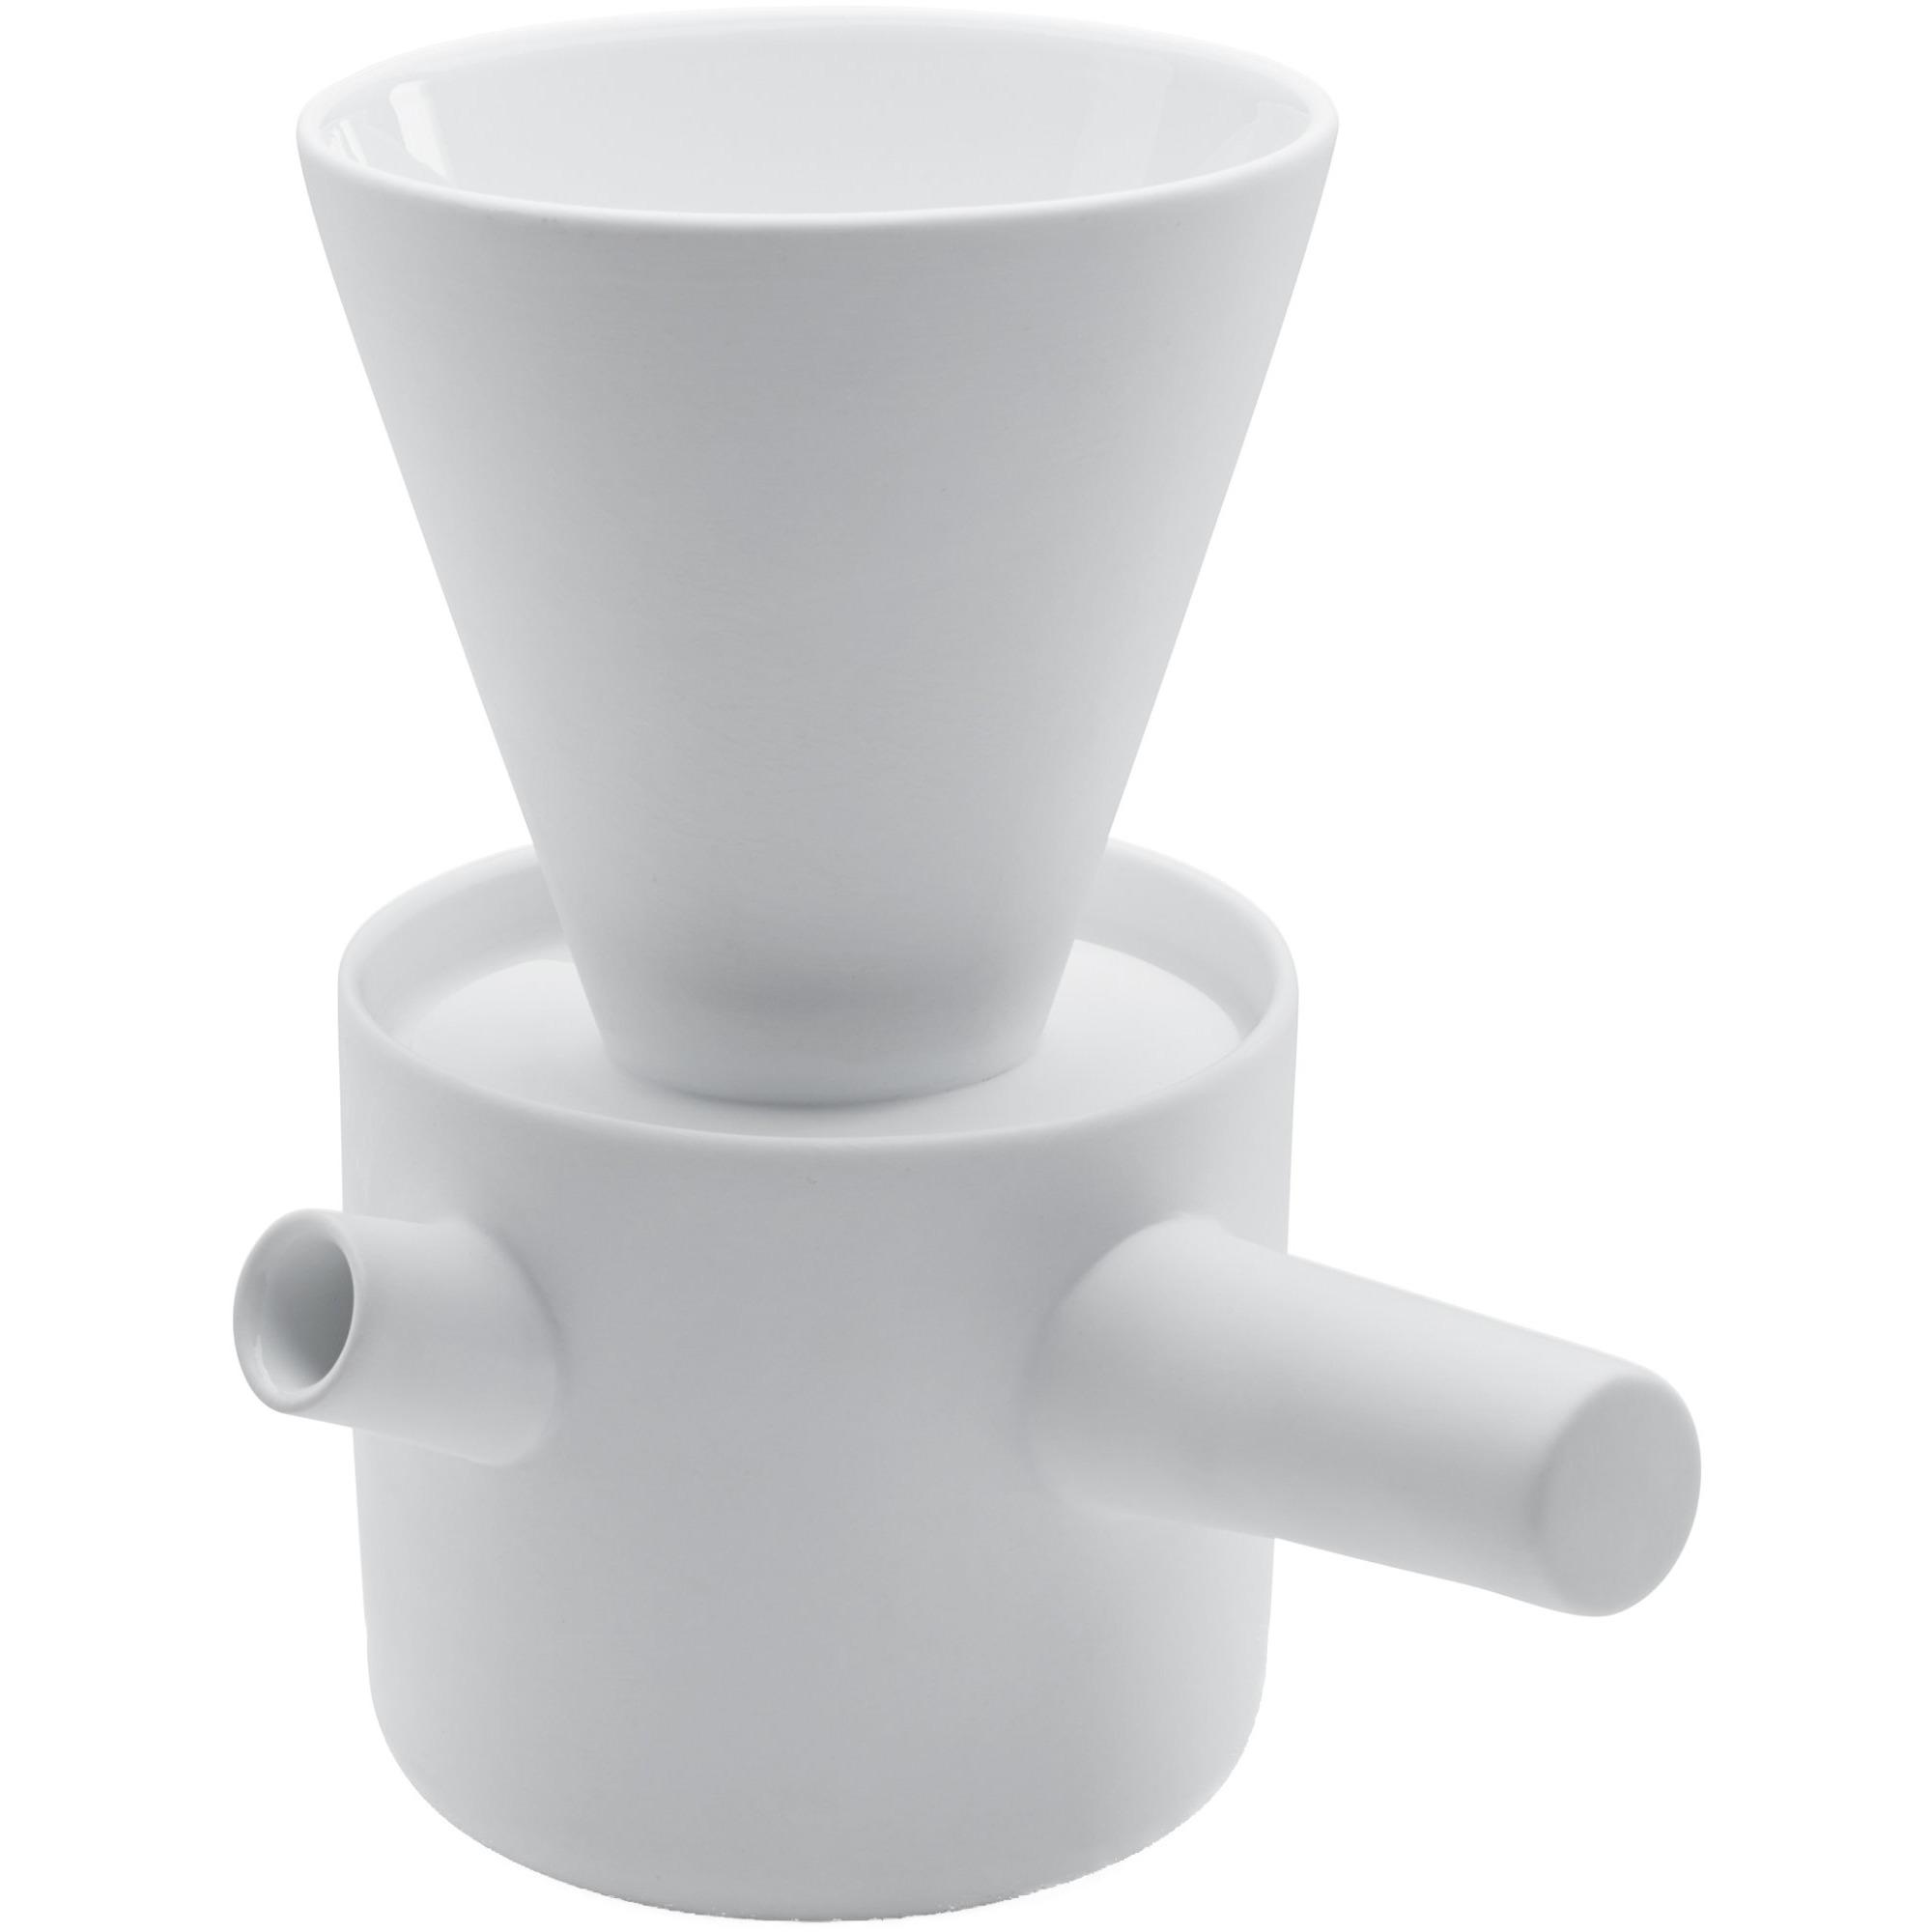 Skagerak Piippu Pour Over Porslin